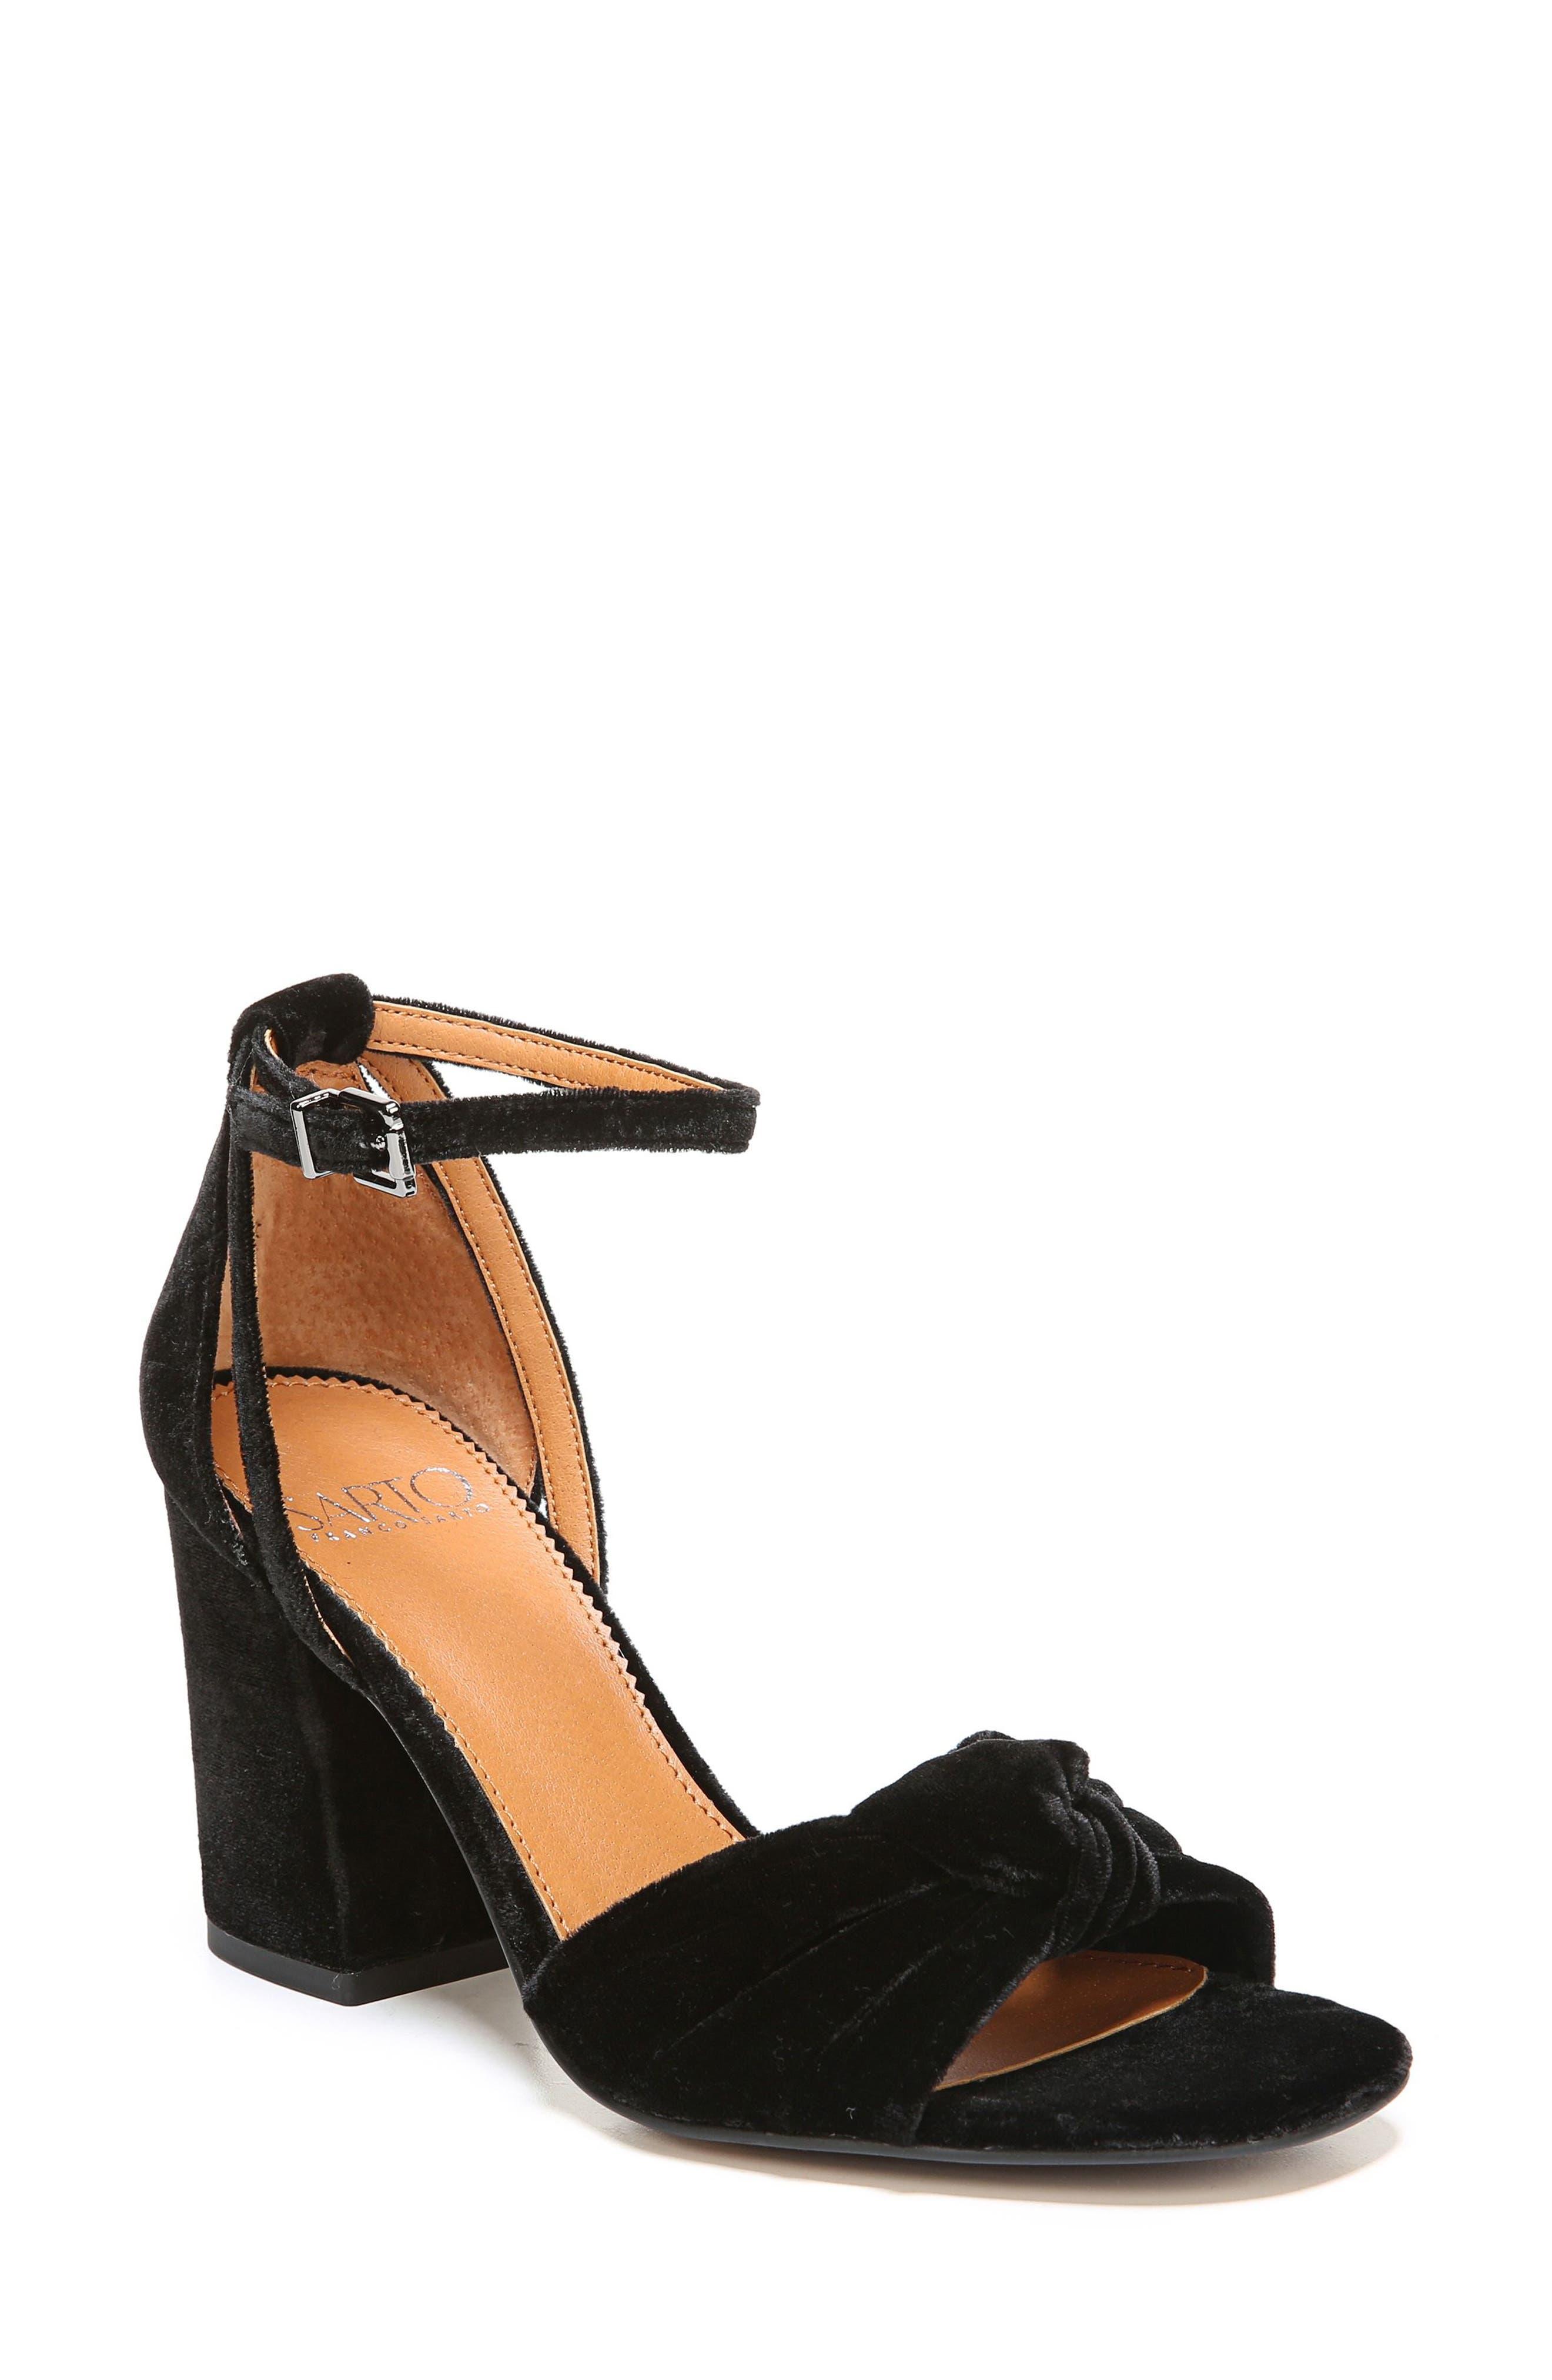 Edana Knotted Block Heel Sandal,                         Main,                         color, 001